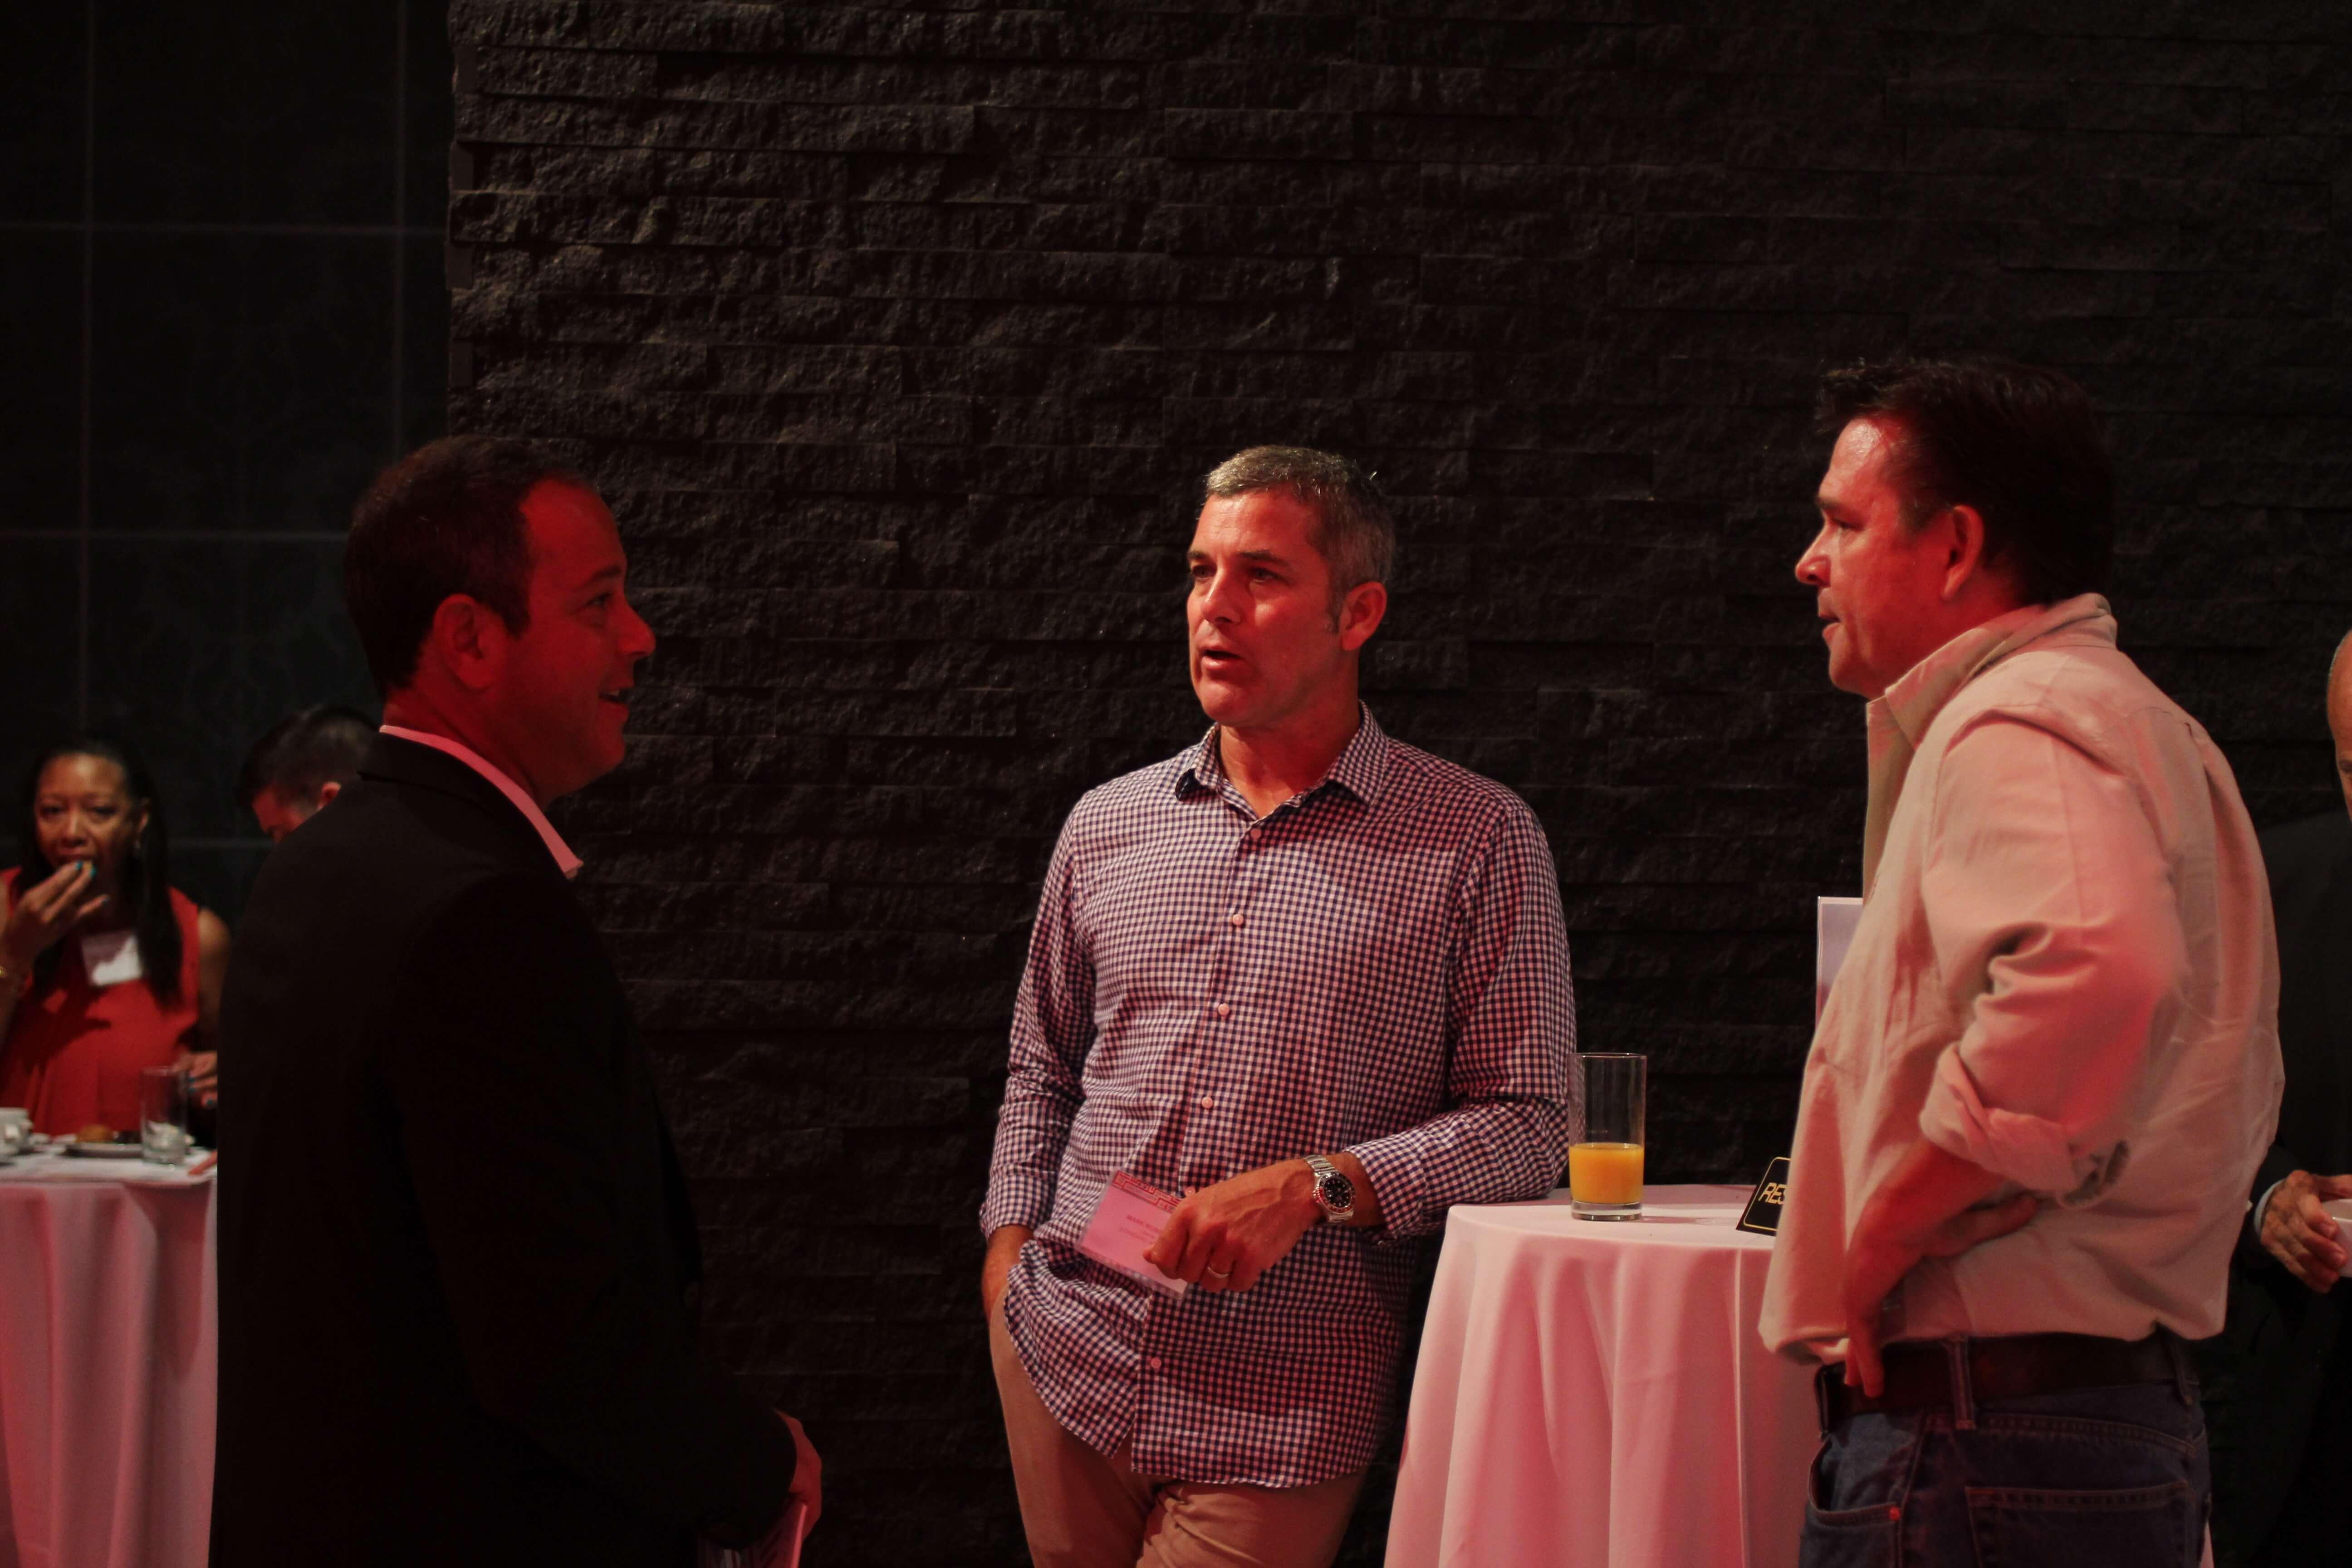 Three men chatting